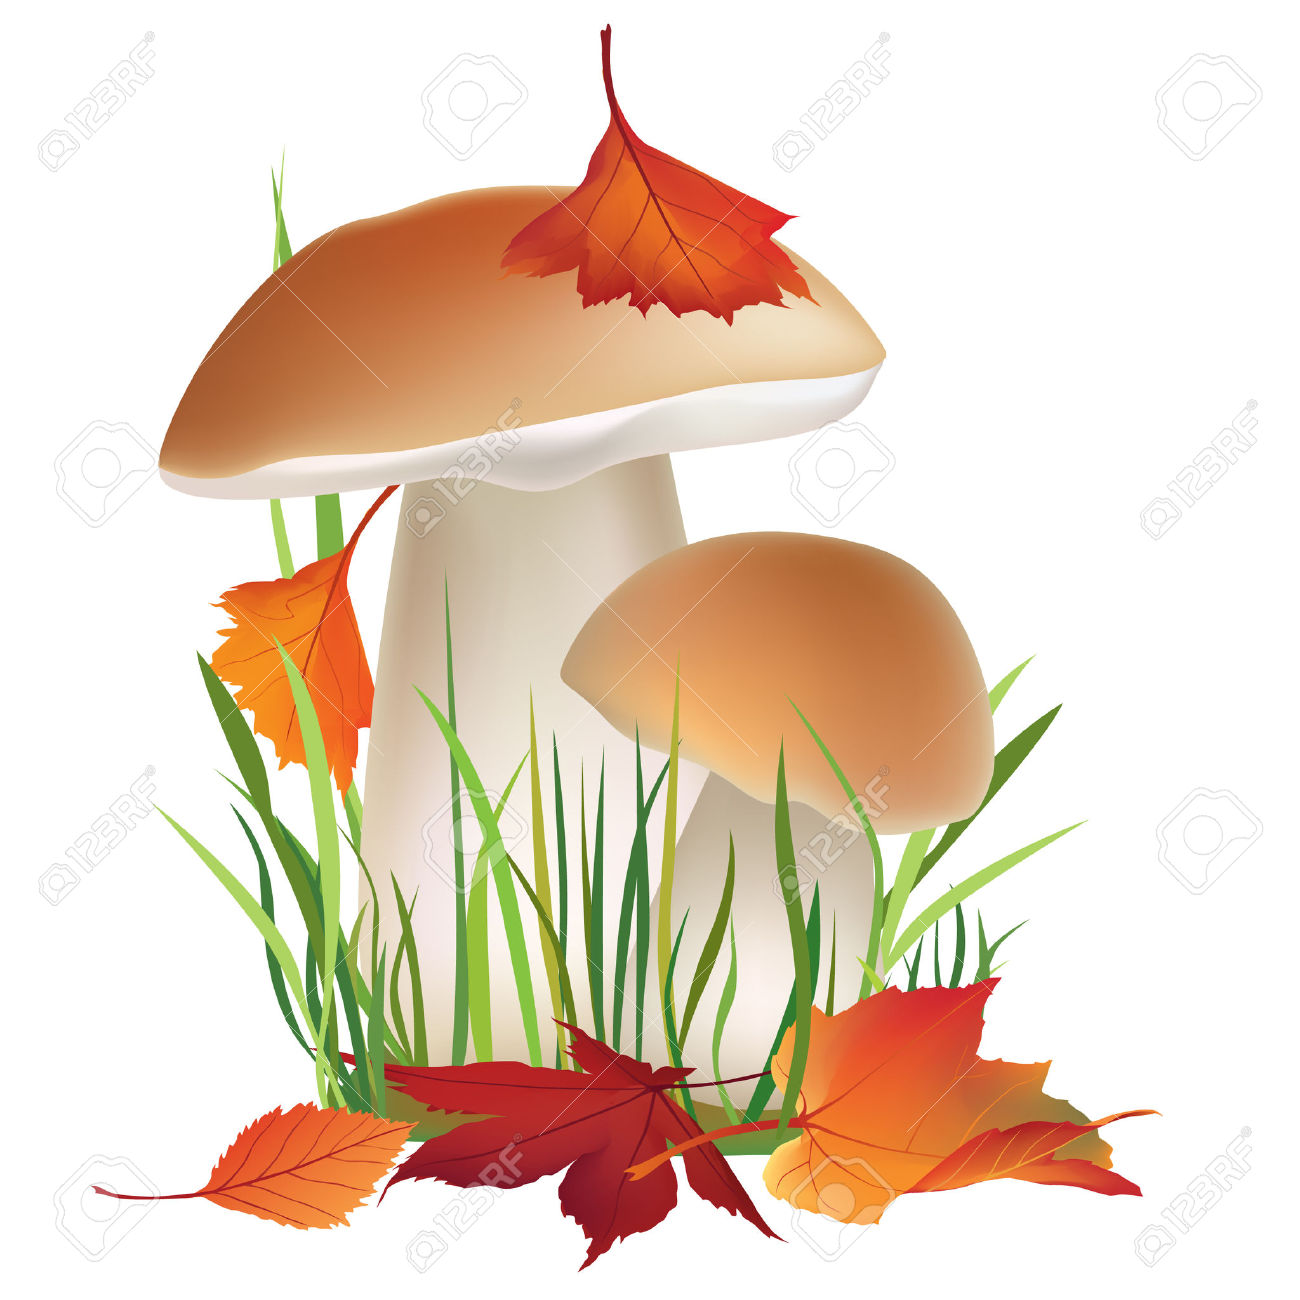 Autumn mushrooms clipart  Clipground